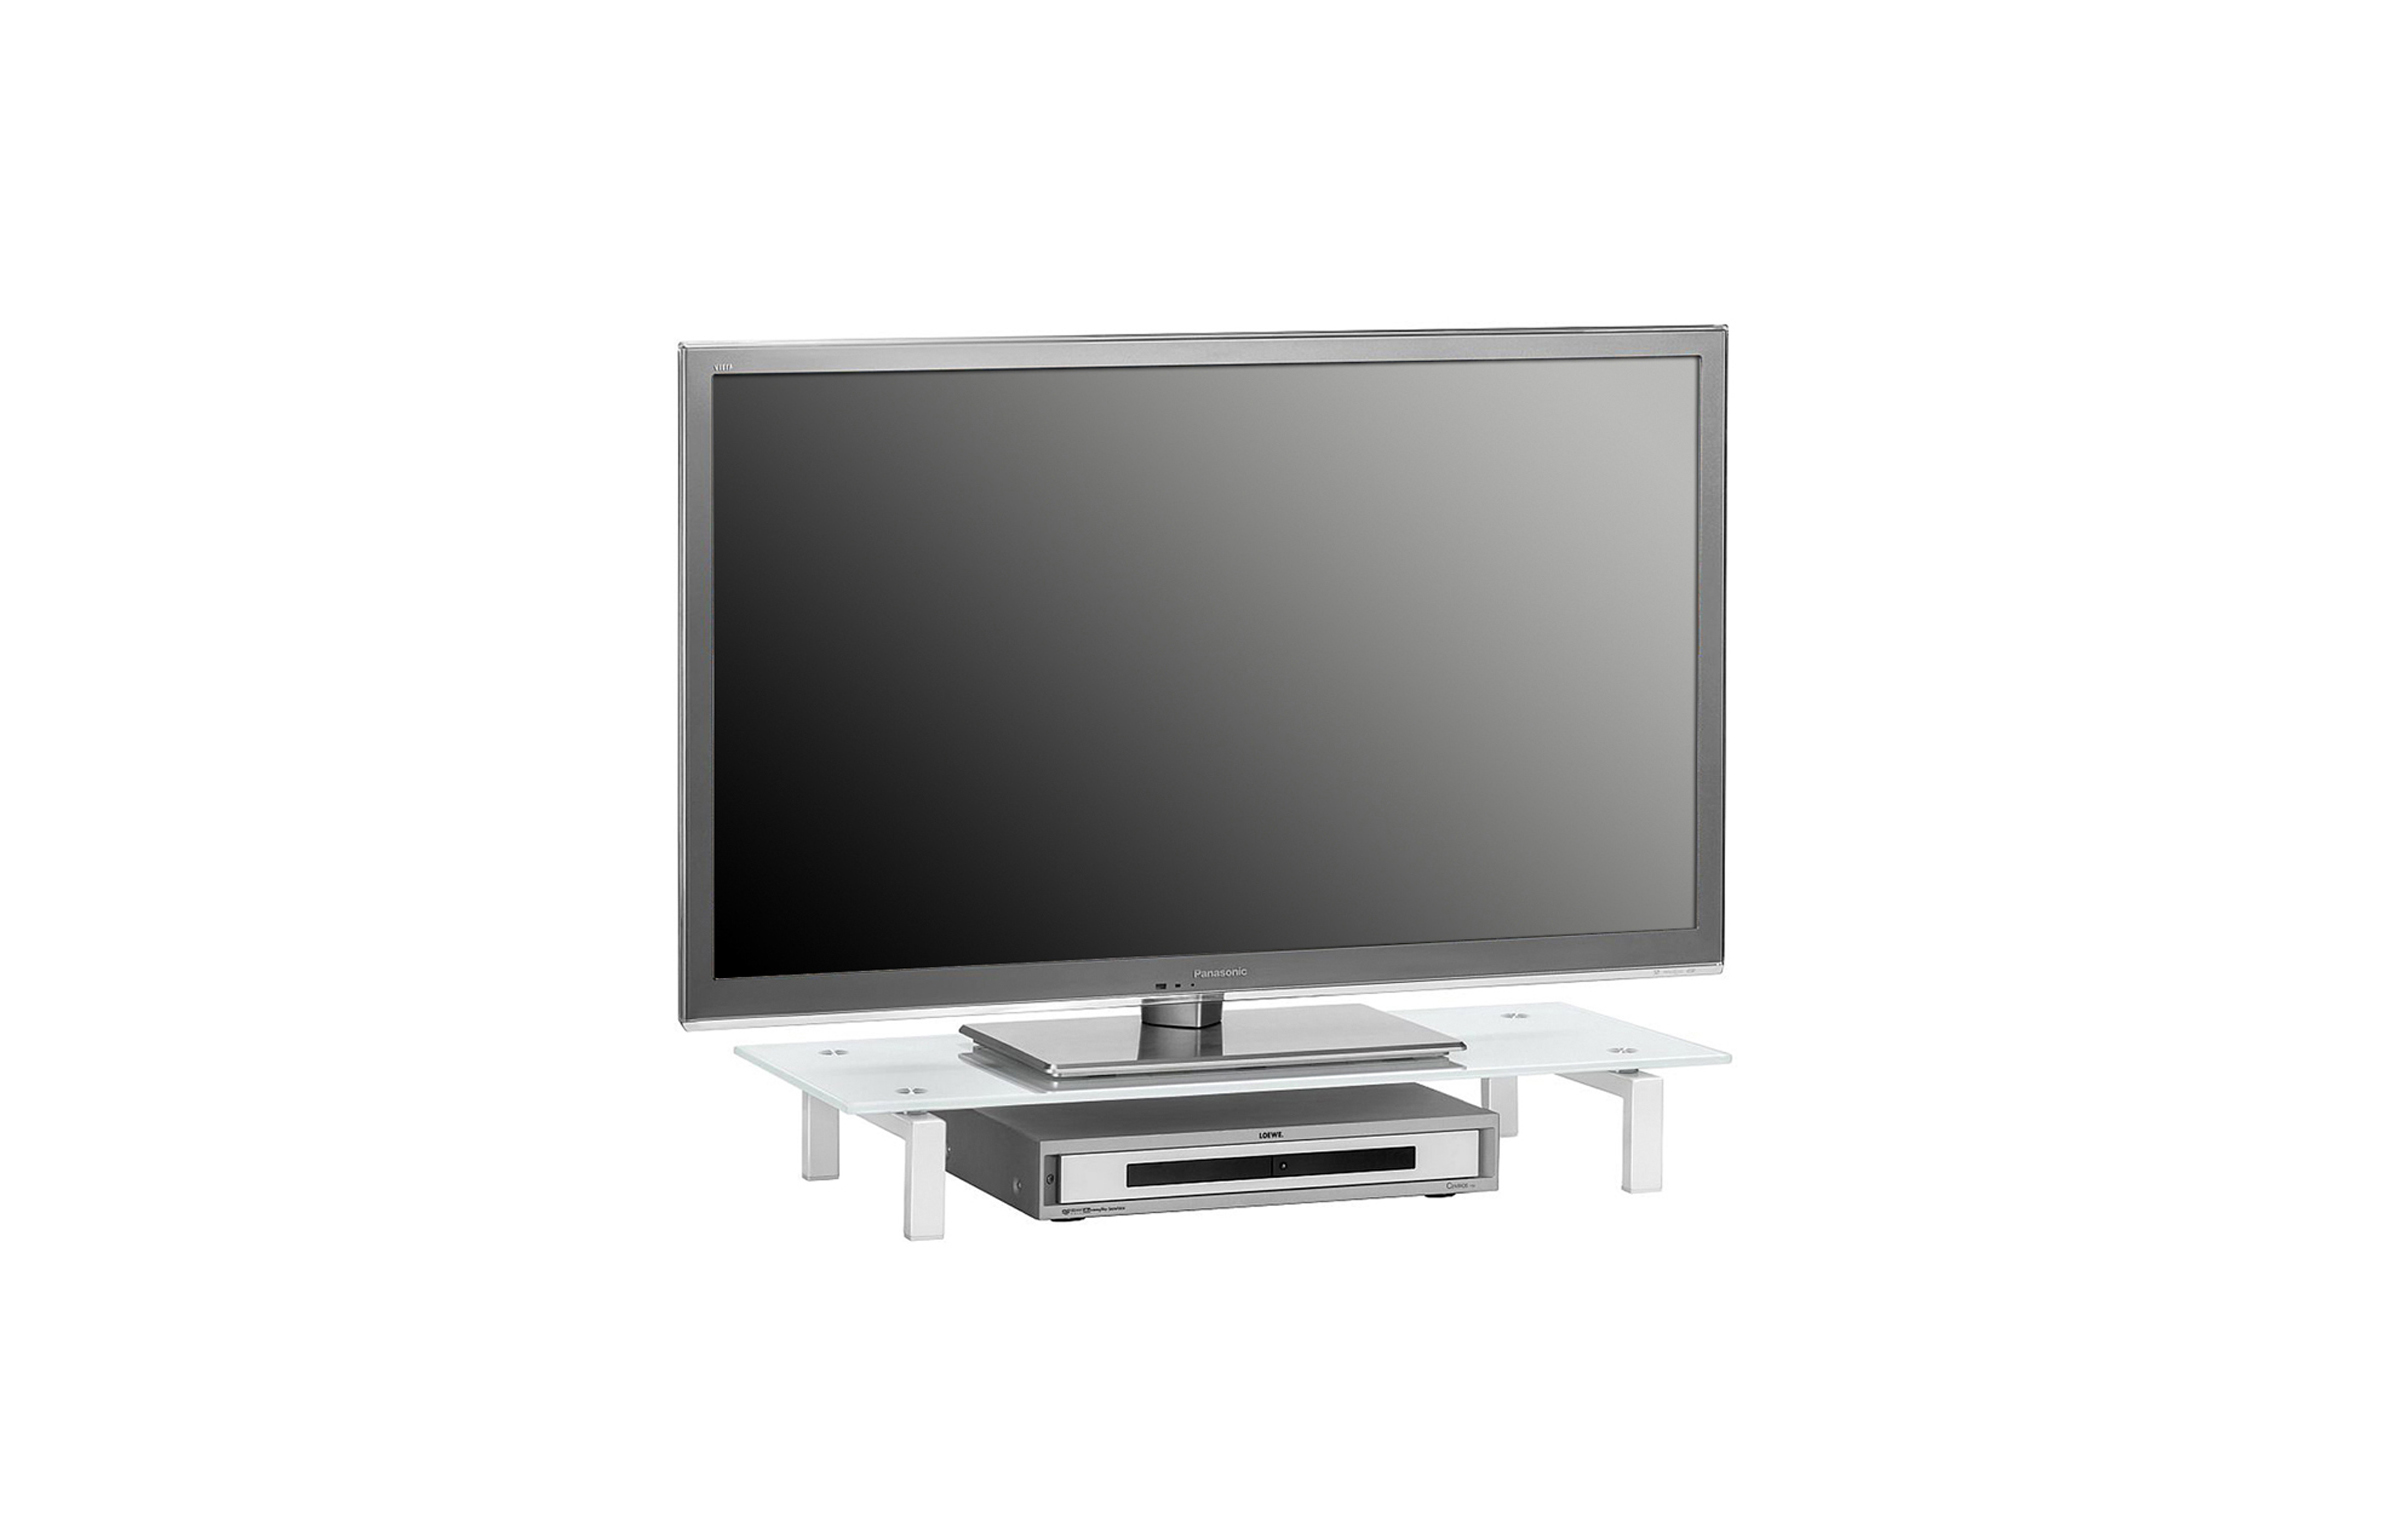 TV-Glasaufsatz Podest ca 80 cm breit Media 1603...